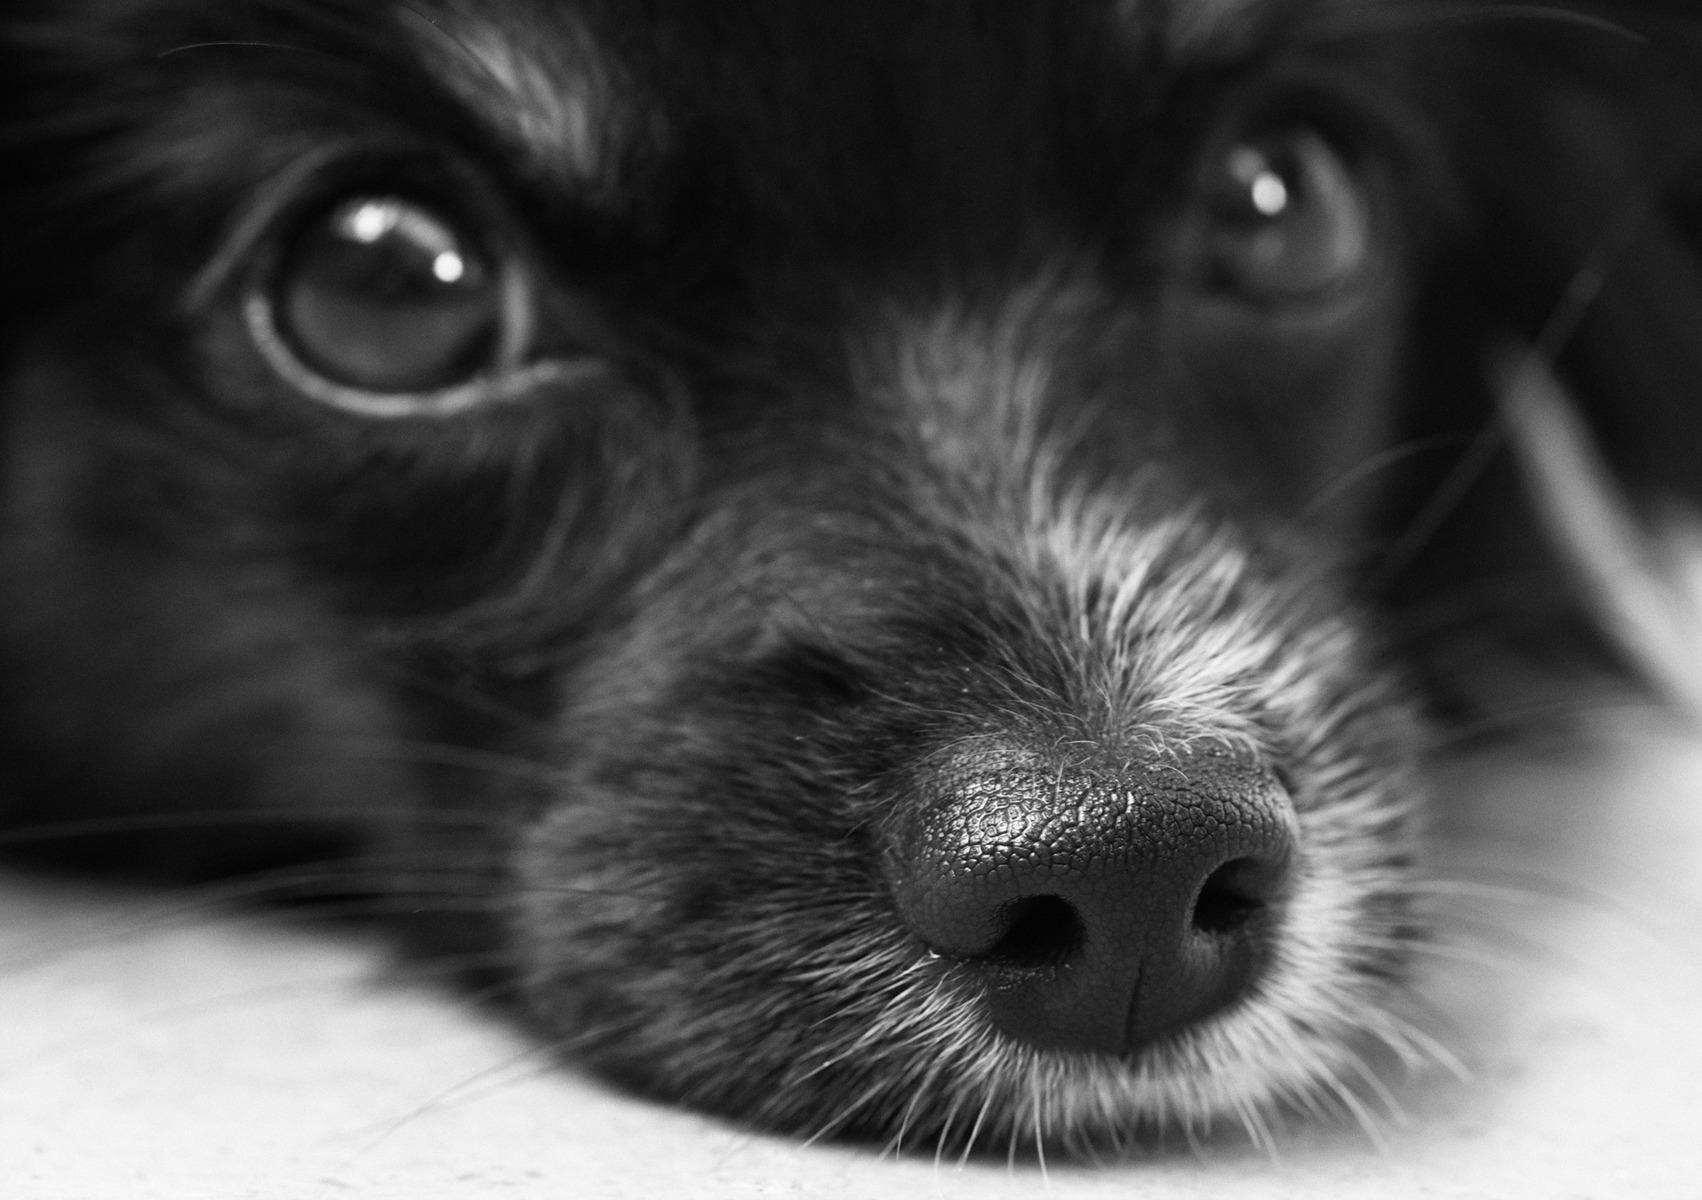 download wallpaper: schattige puppie wallpaper